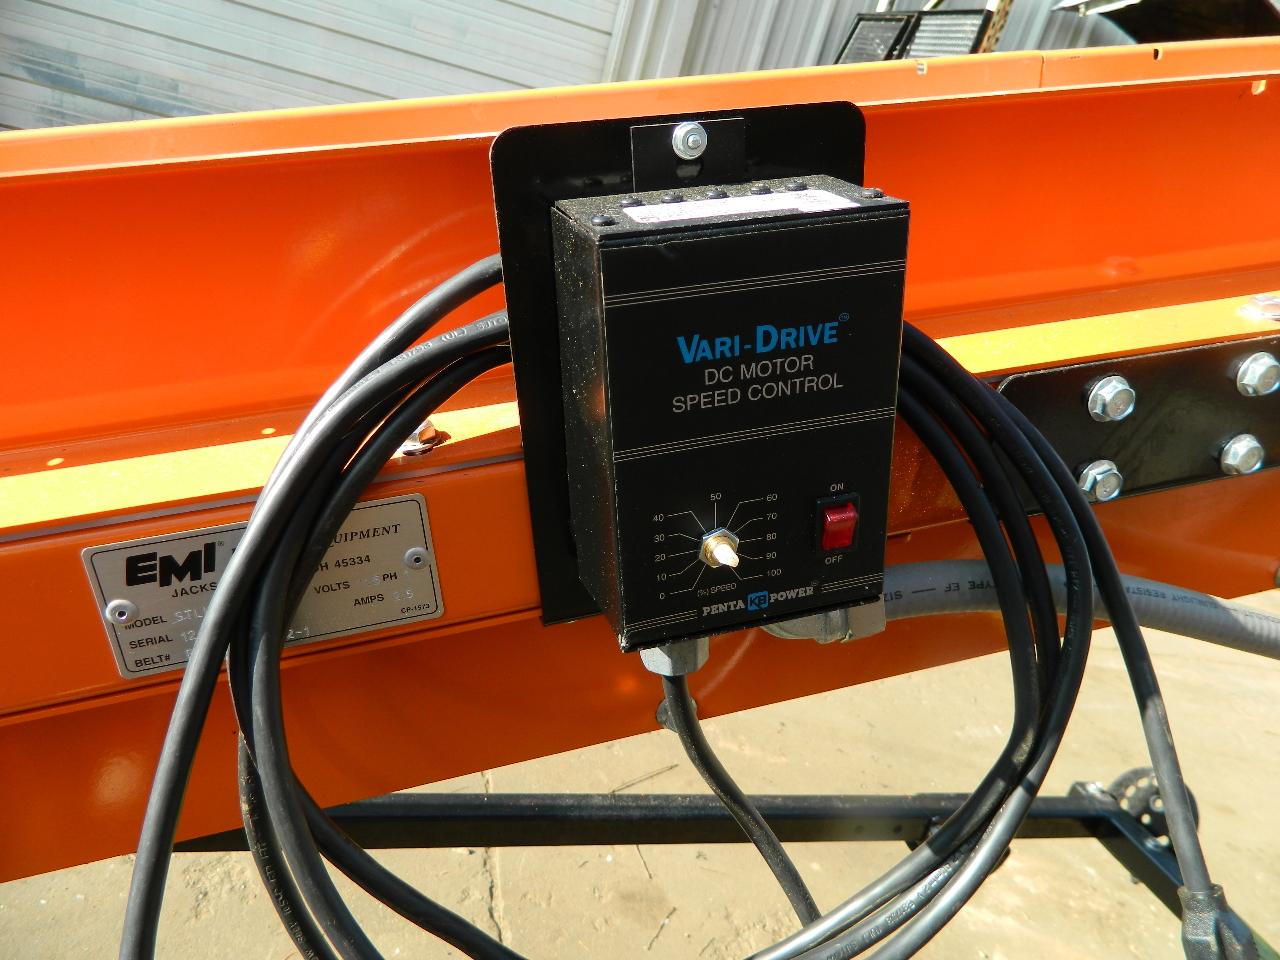 Emi Plastics Stlk Incline Belt Conveyor 18 L X 11 5 W